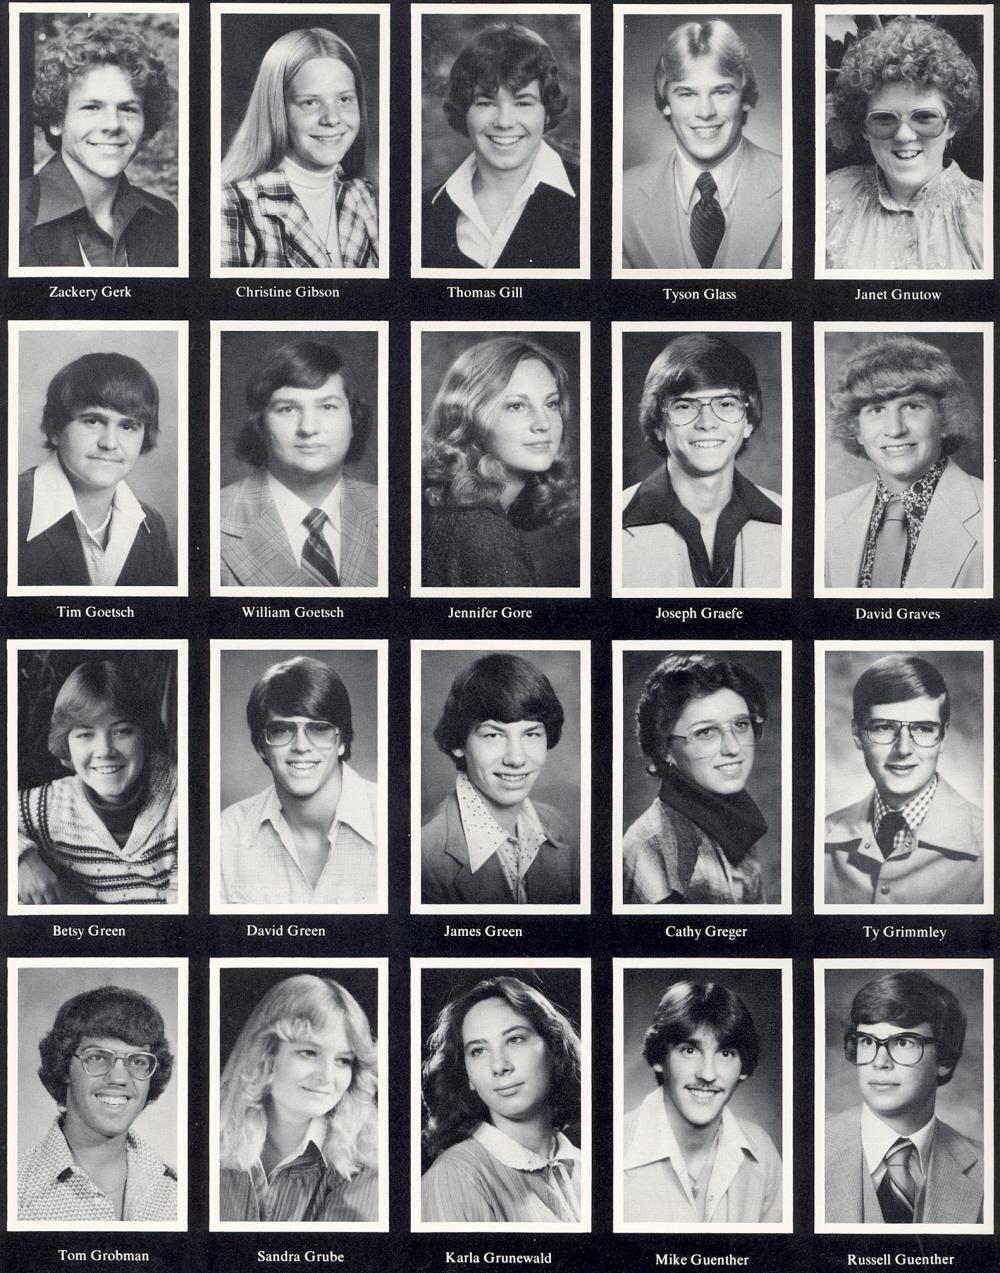 Cool 1980 Sheboygan North High School Yearbook Hairstyles For Men Maxibearus